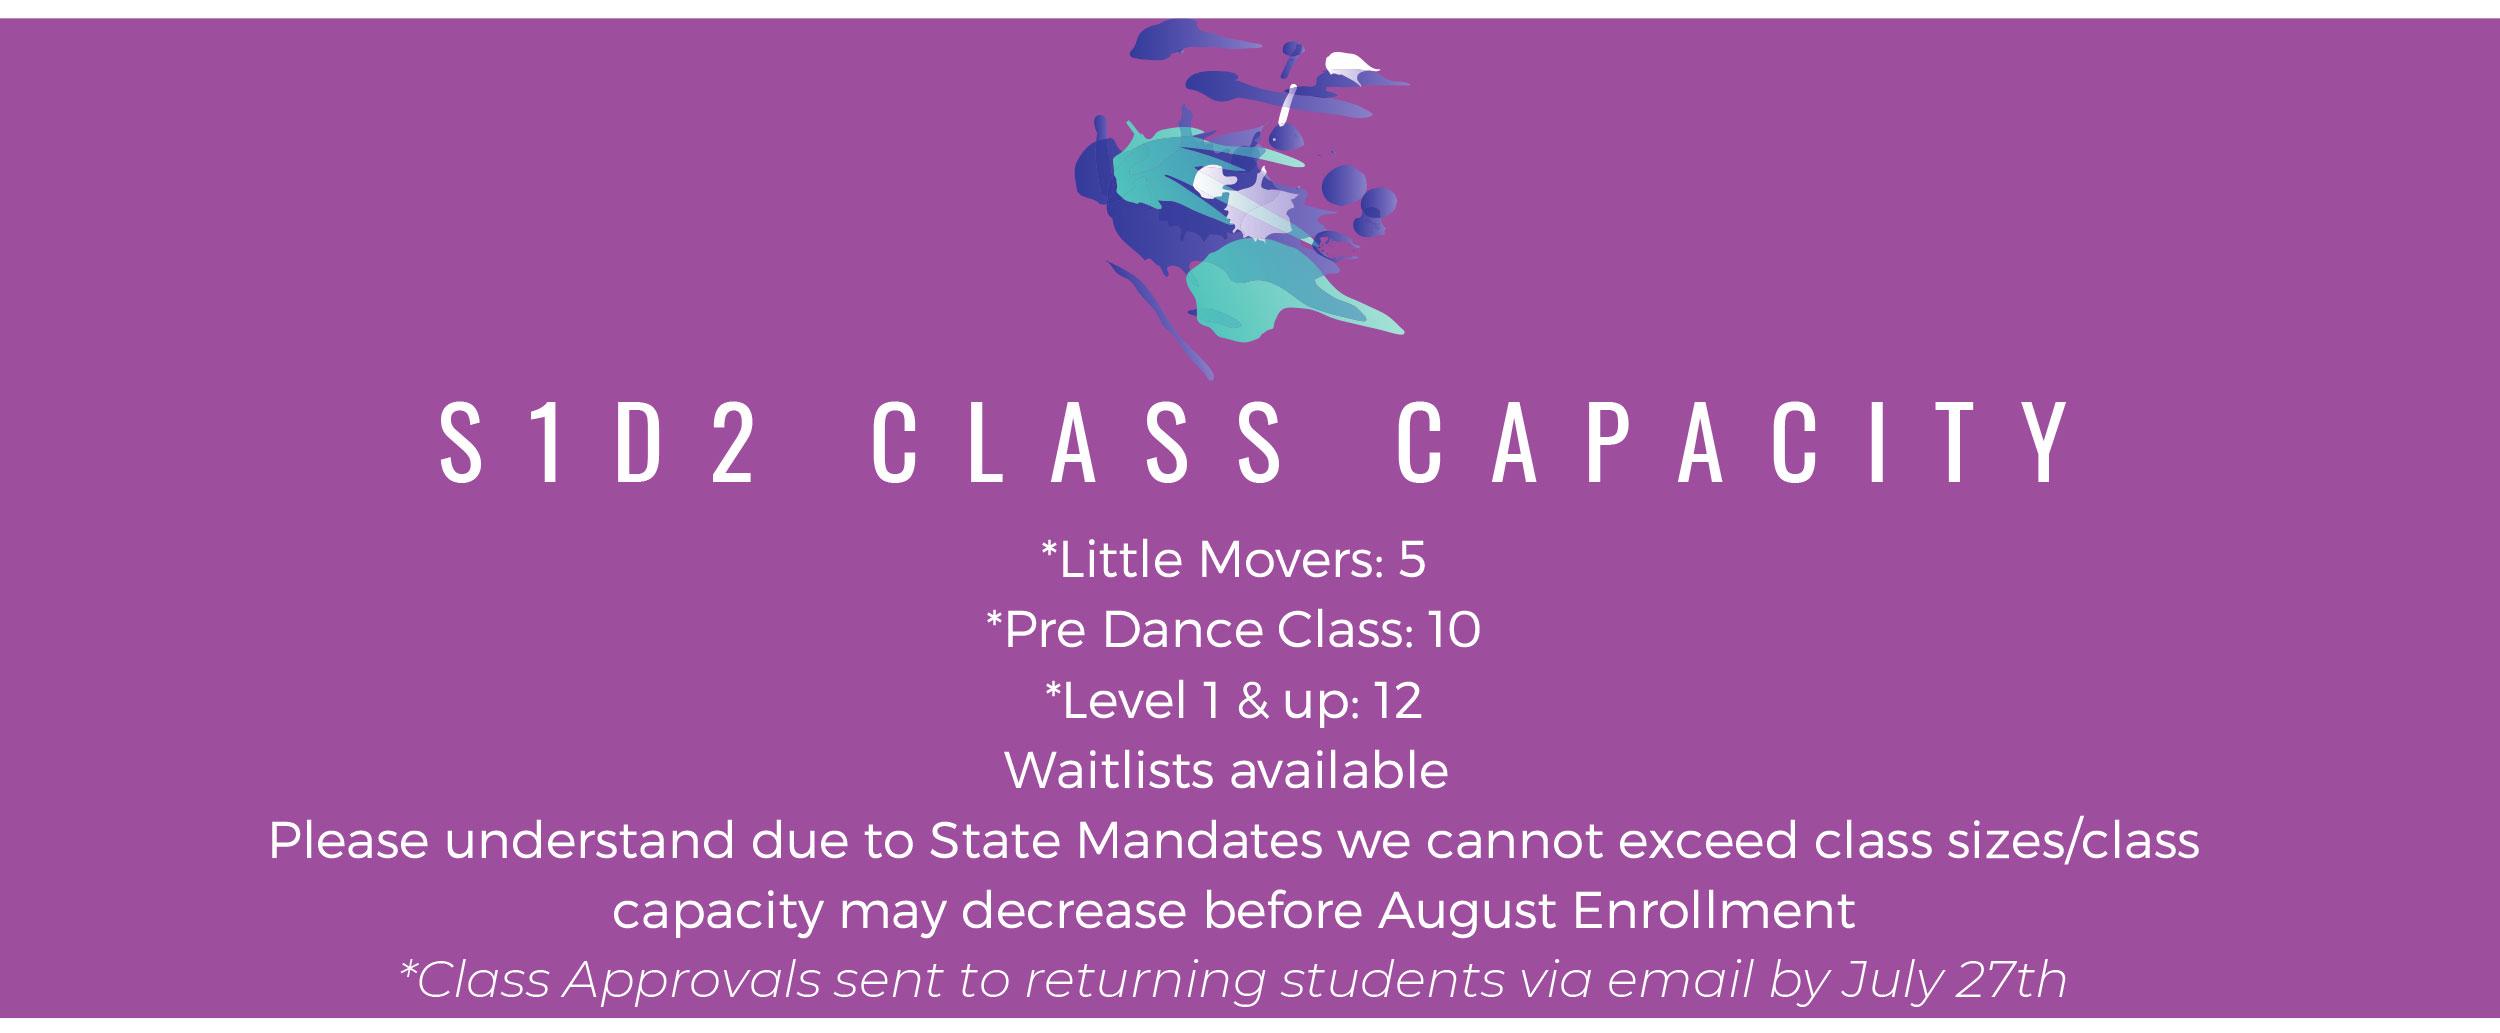 S1D2 Class Capacity